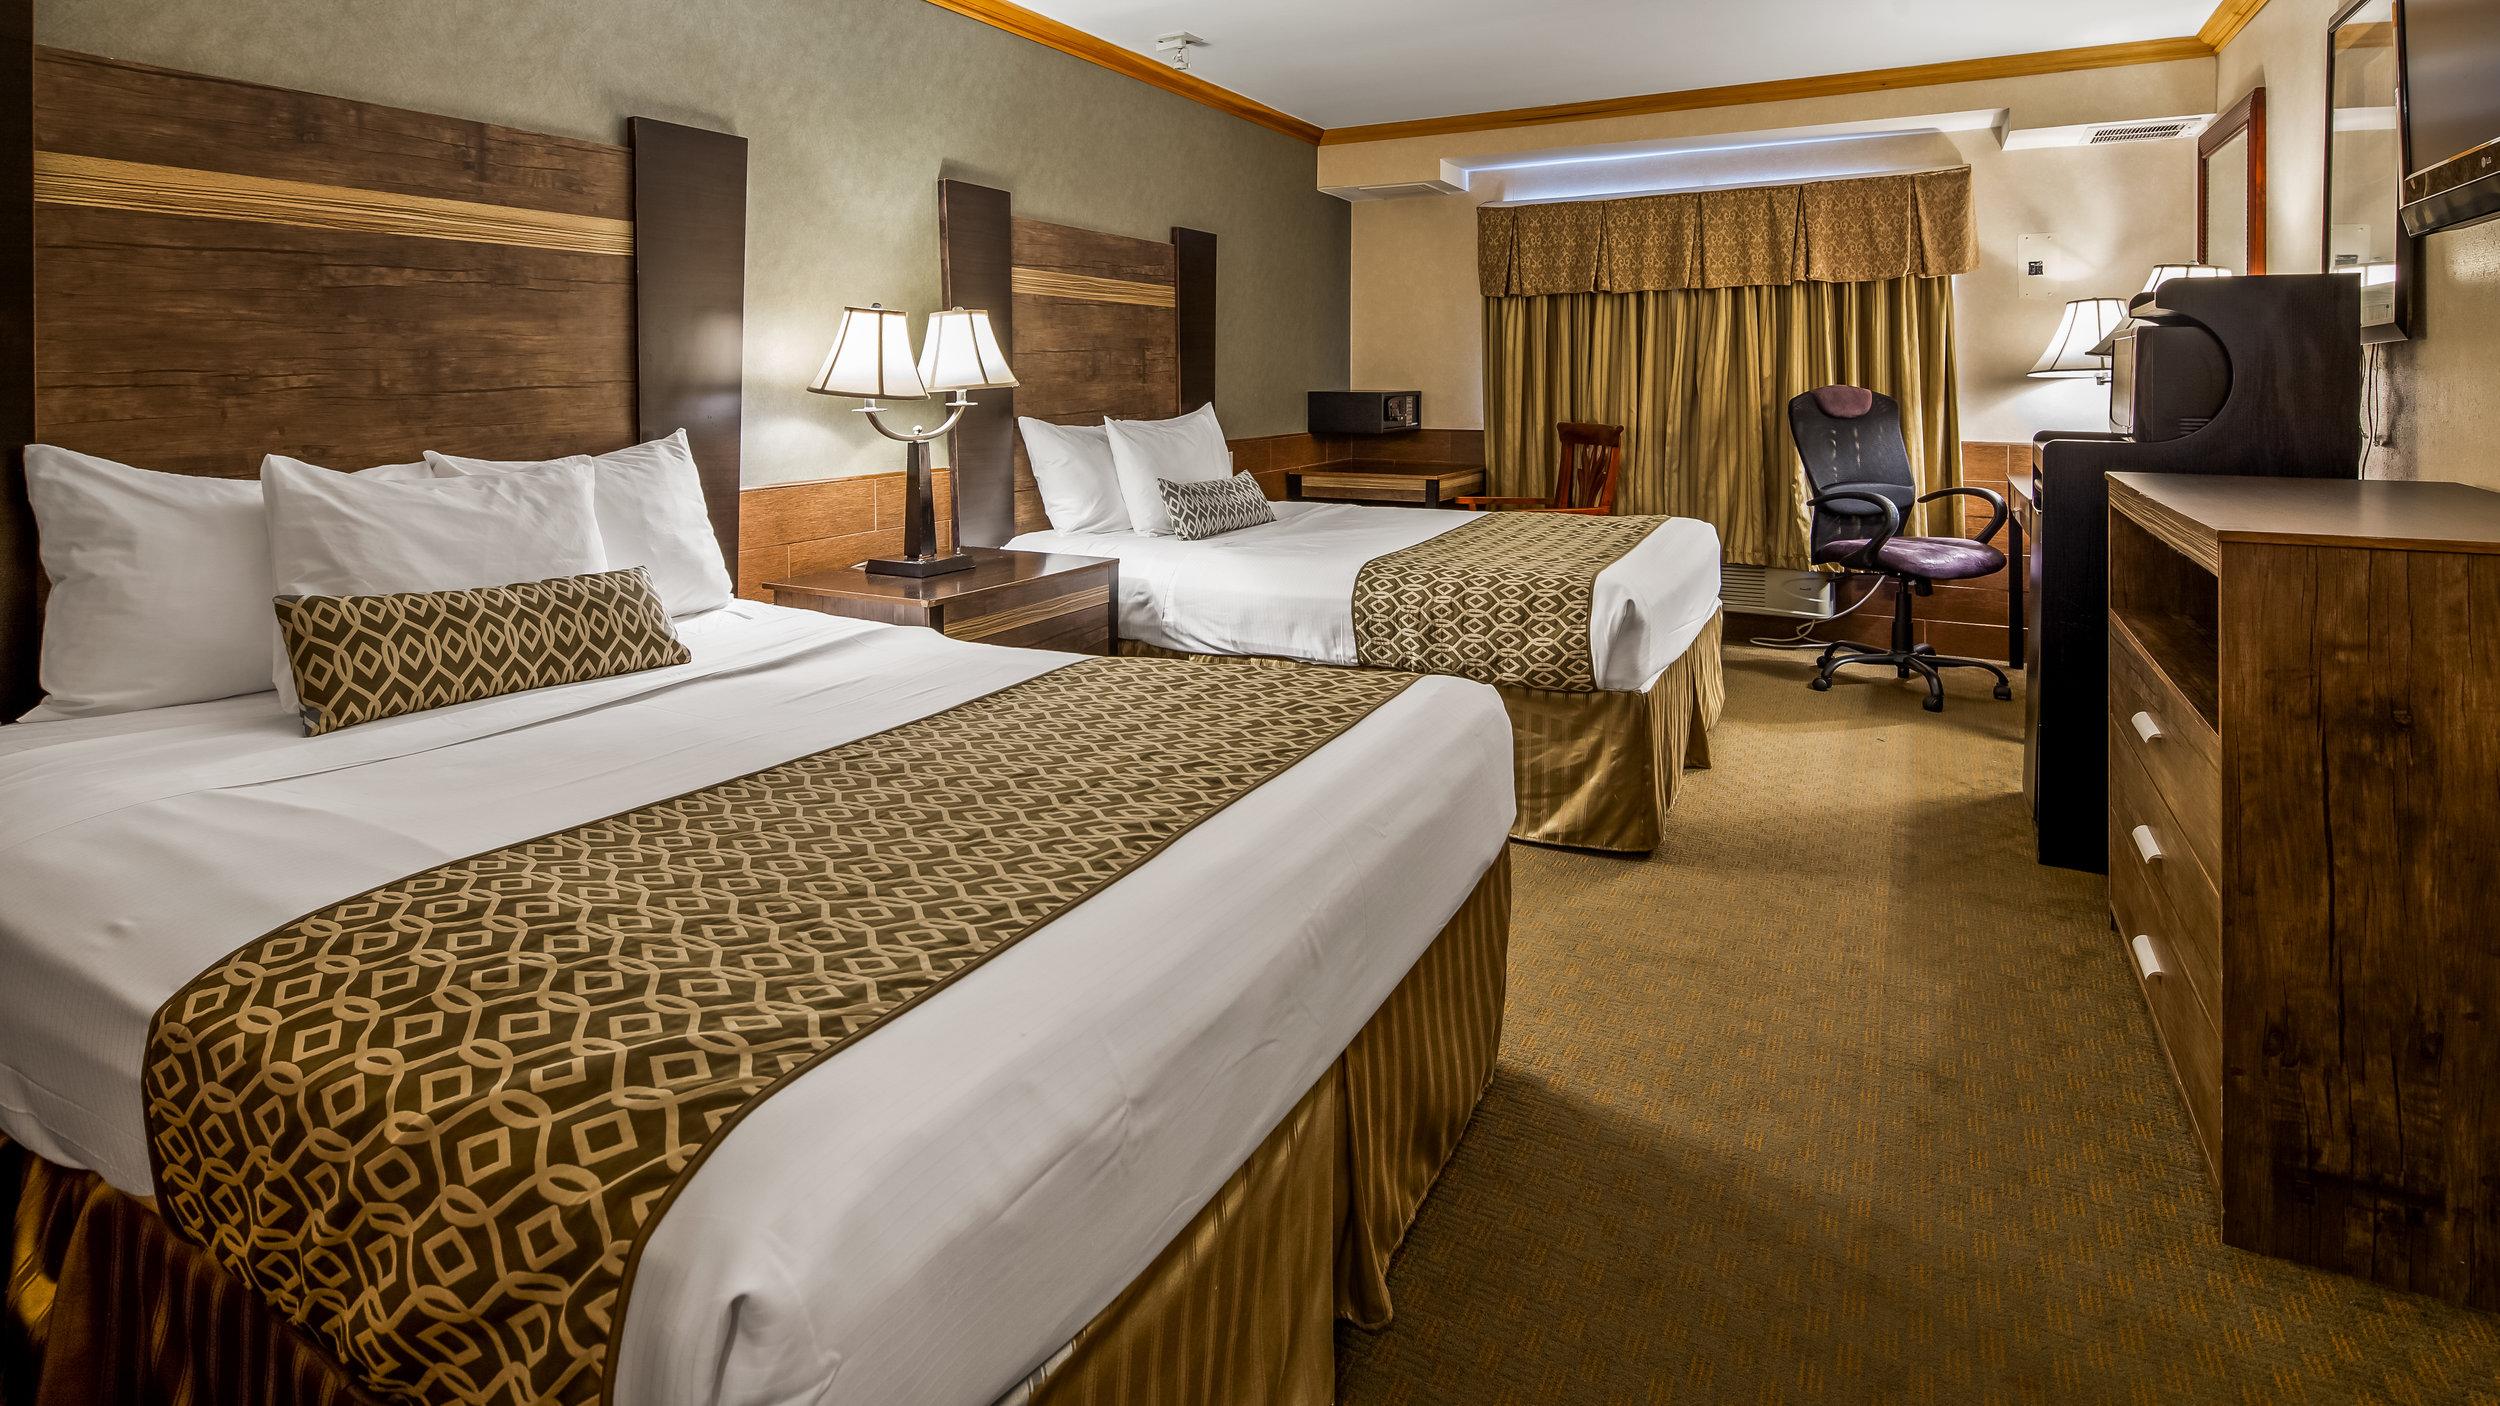 Two Beds Room Baymont by Wyndham Pompton Plains Wayne